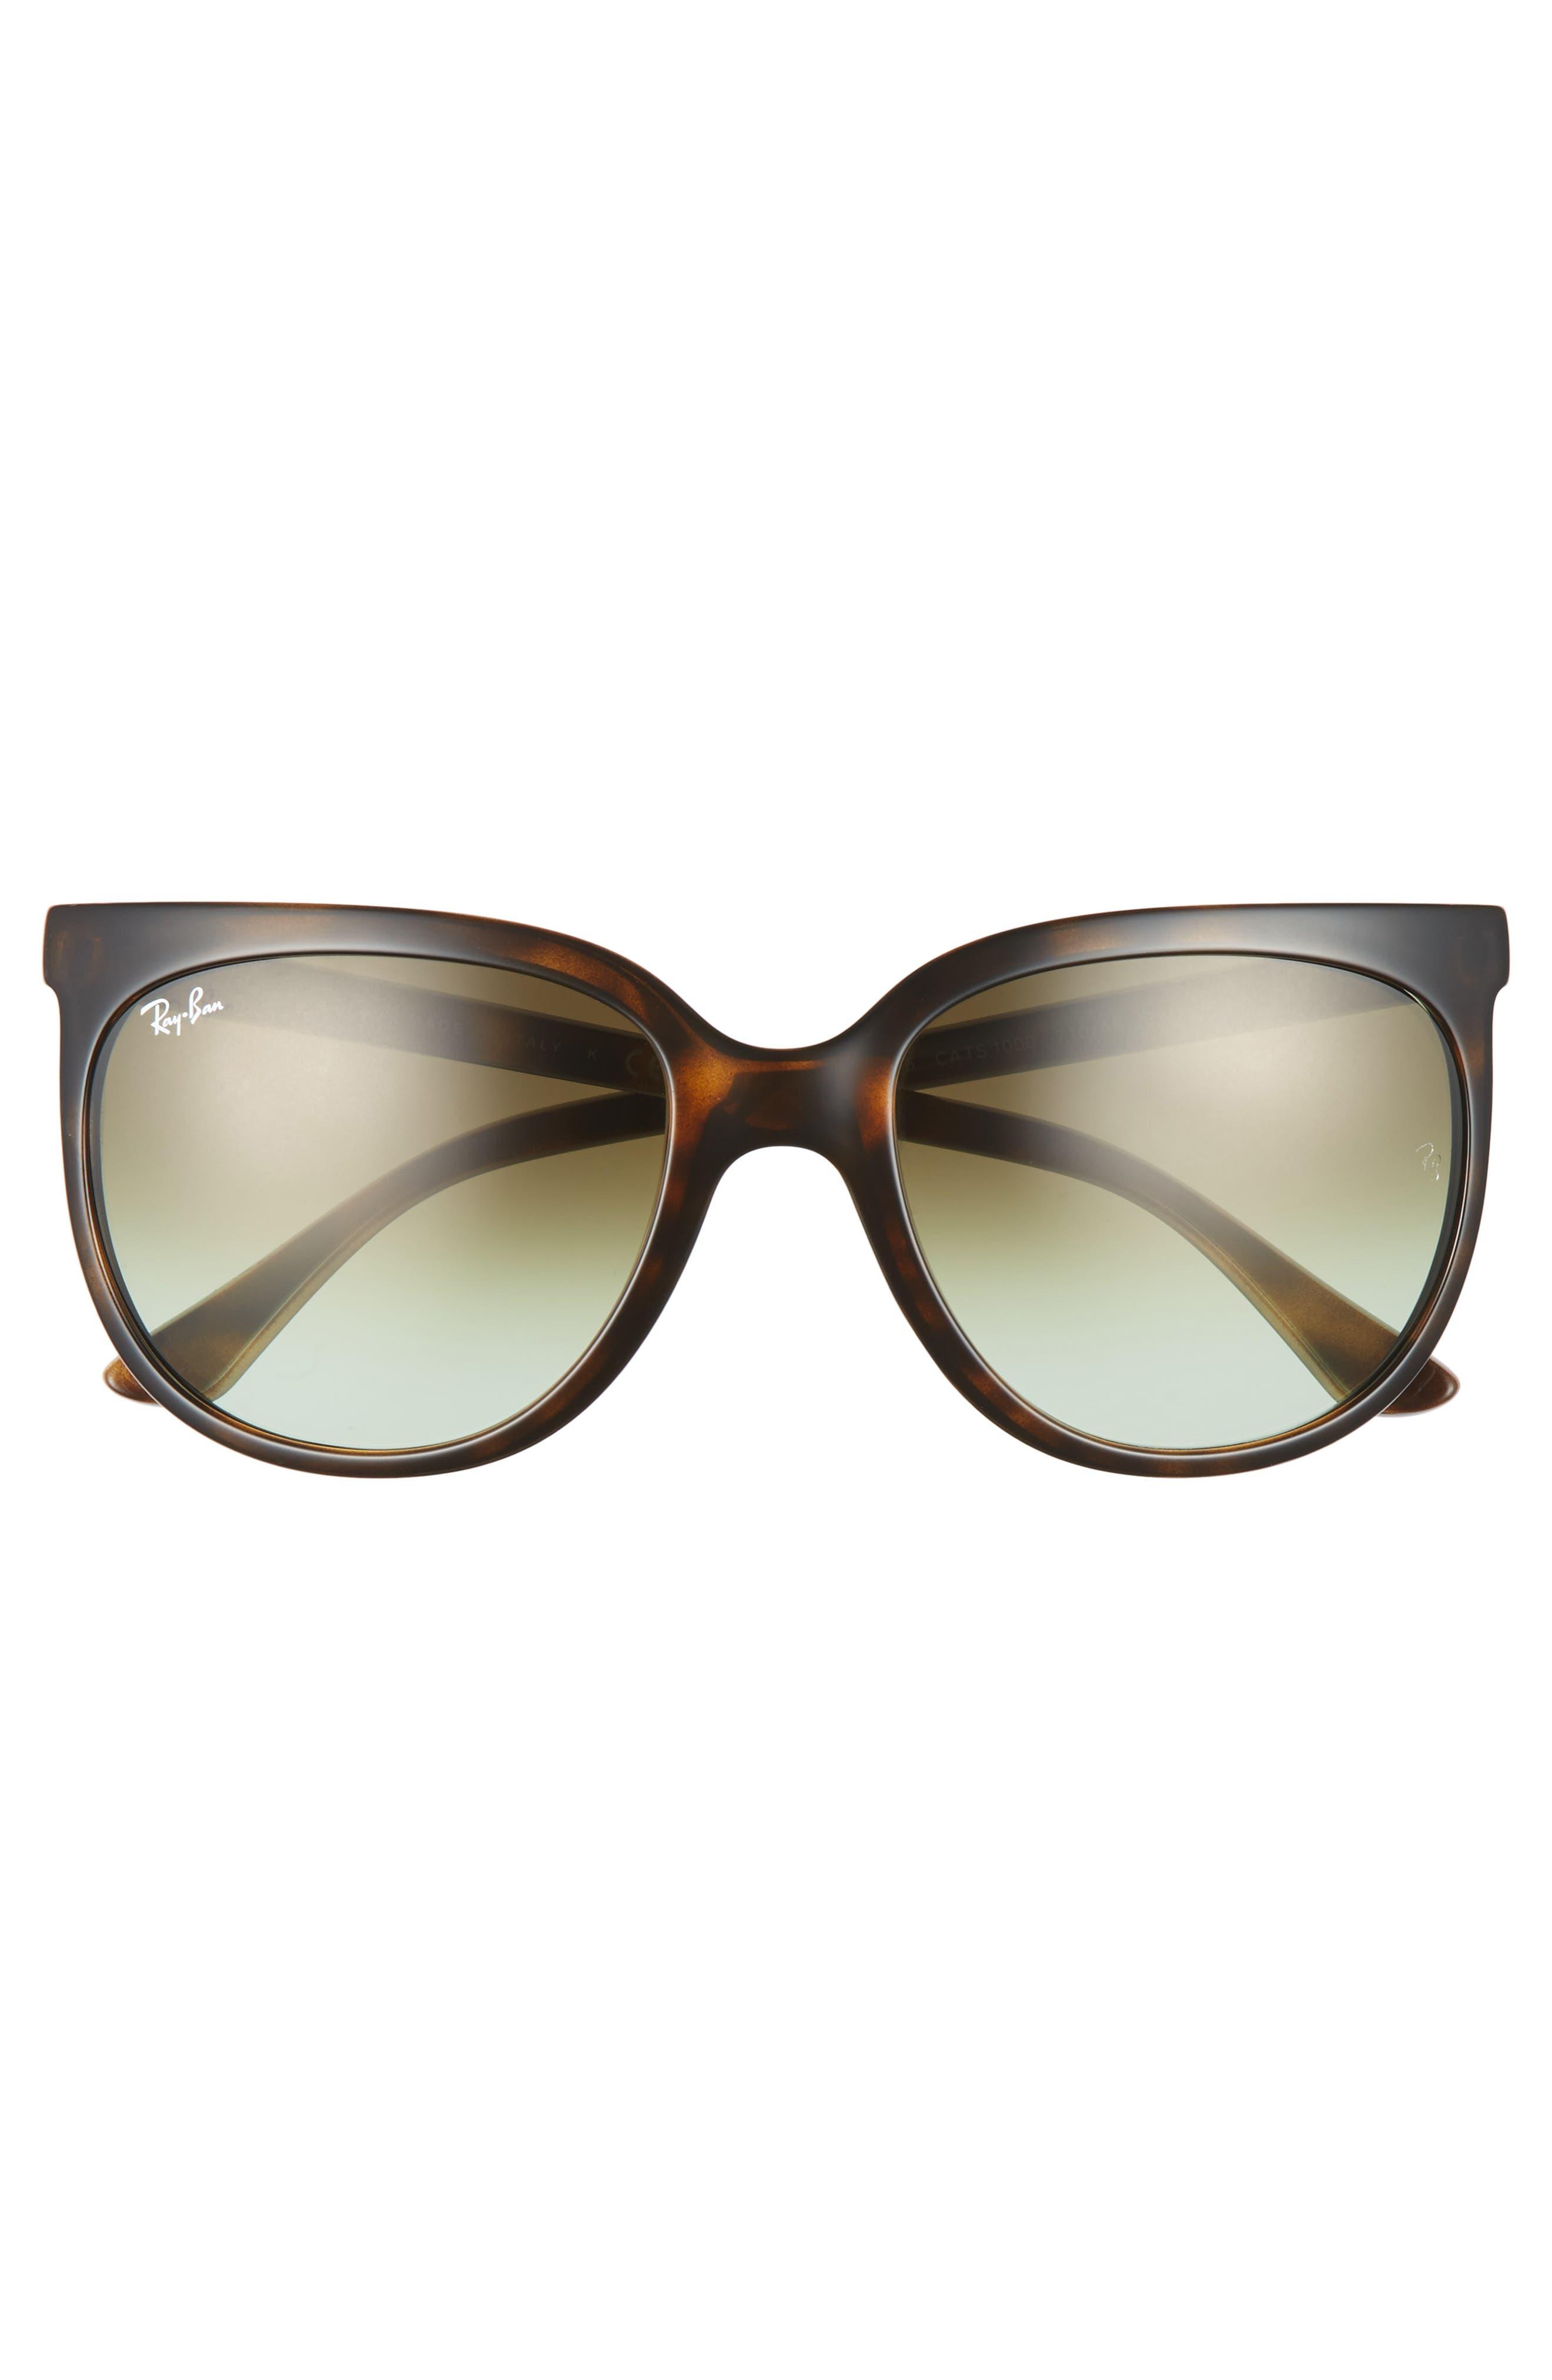 Retro Cat Eye Sunglasses,                             Alternate thumbnail 19, color,